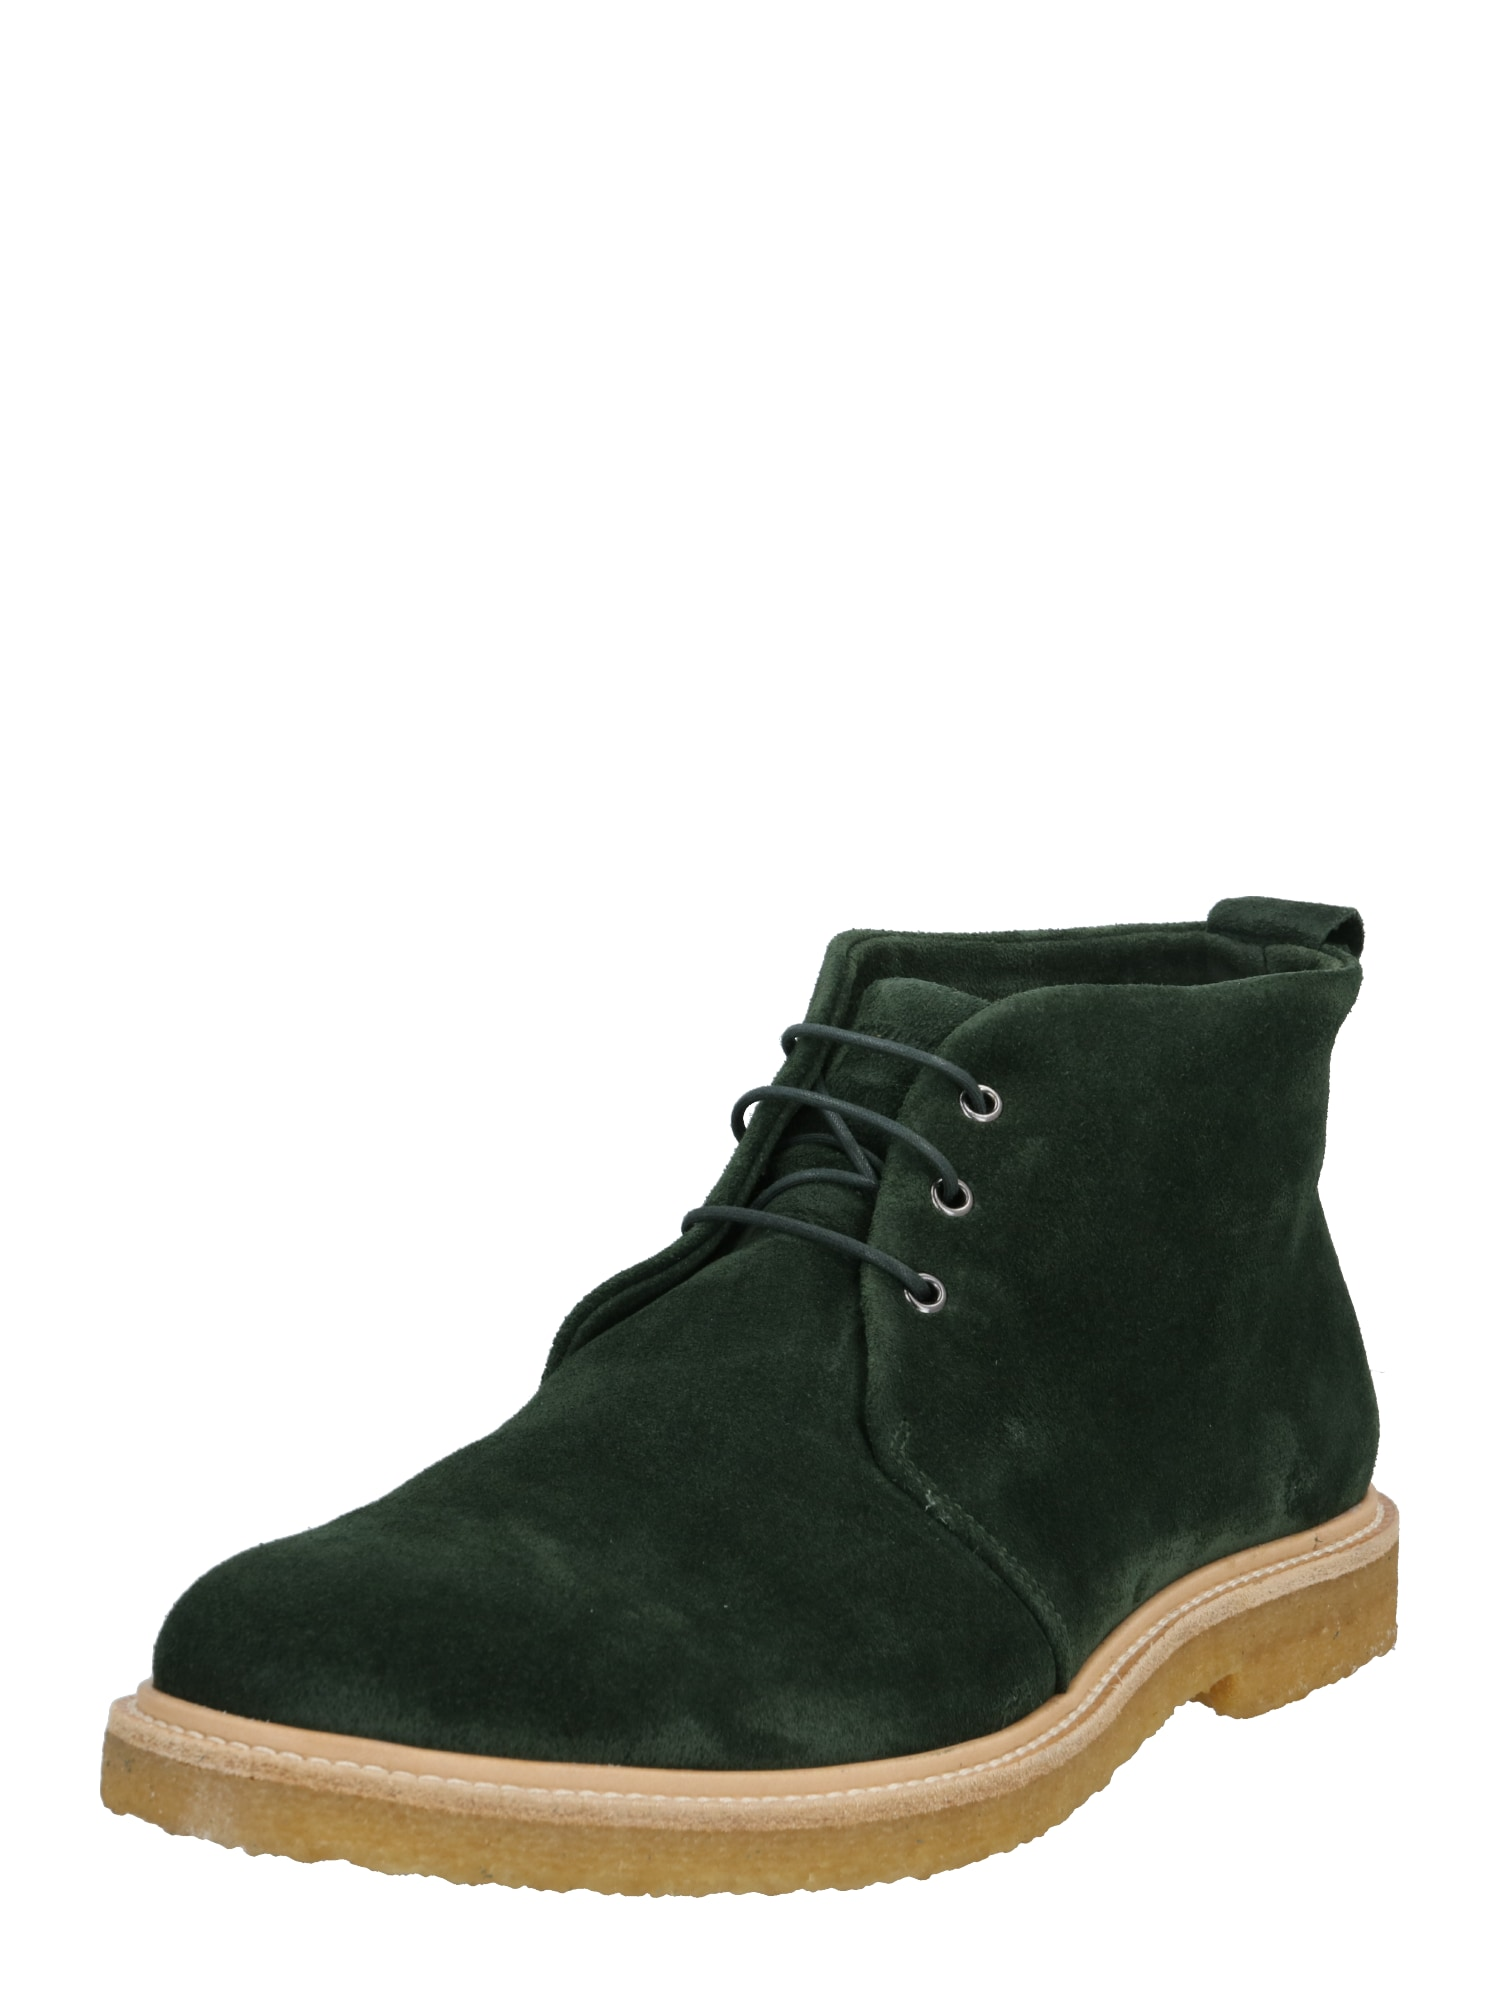 "ROYAL REPUBLIQ ""Chukka"" batai tamsiai žalia"